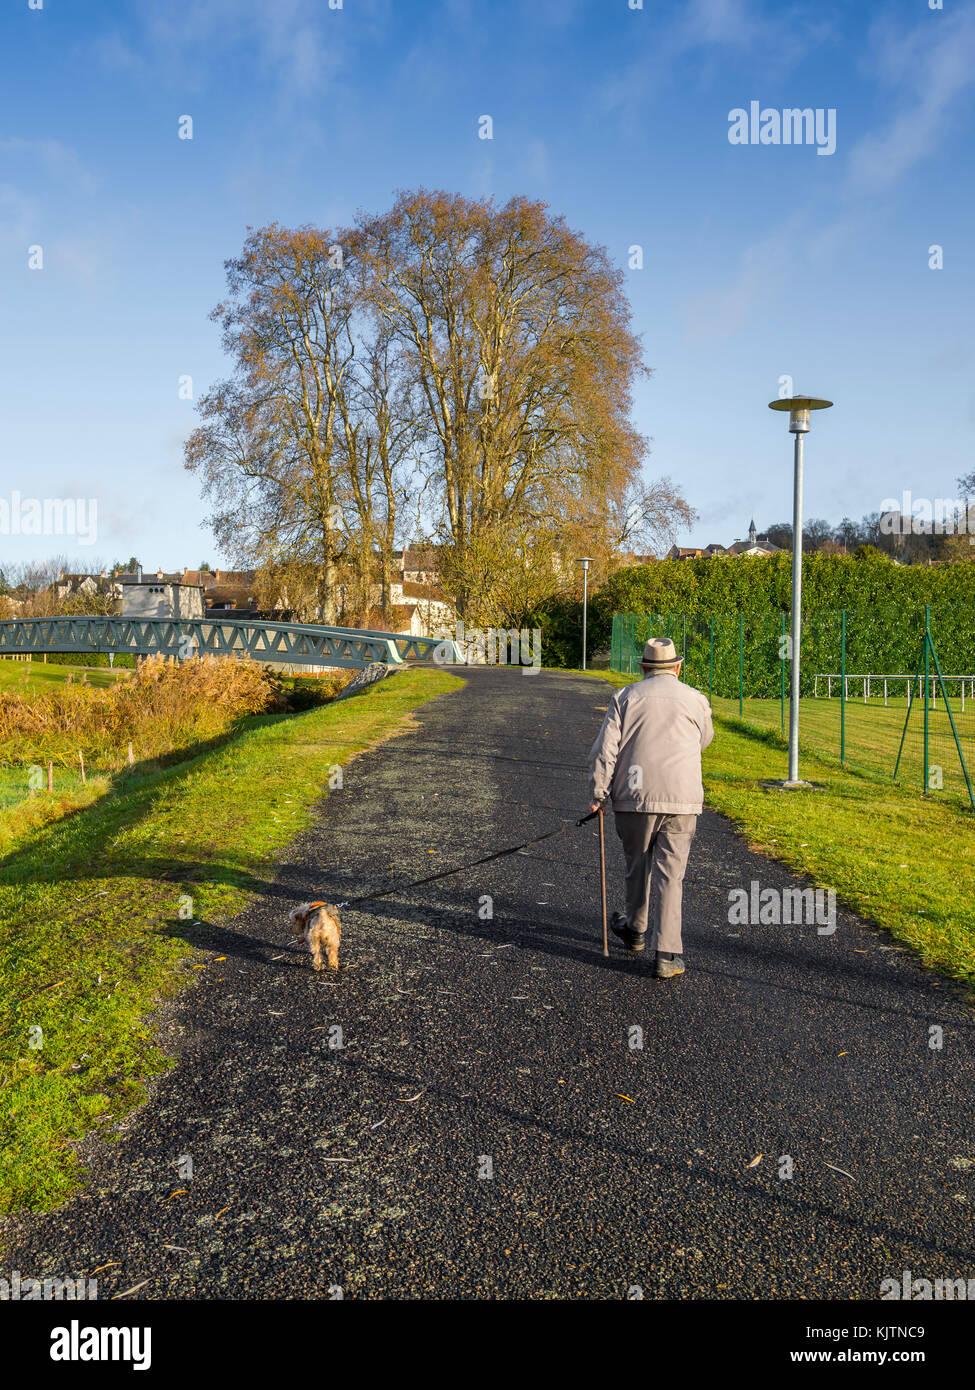 Old man walking dog on leash - France. - Stock Image